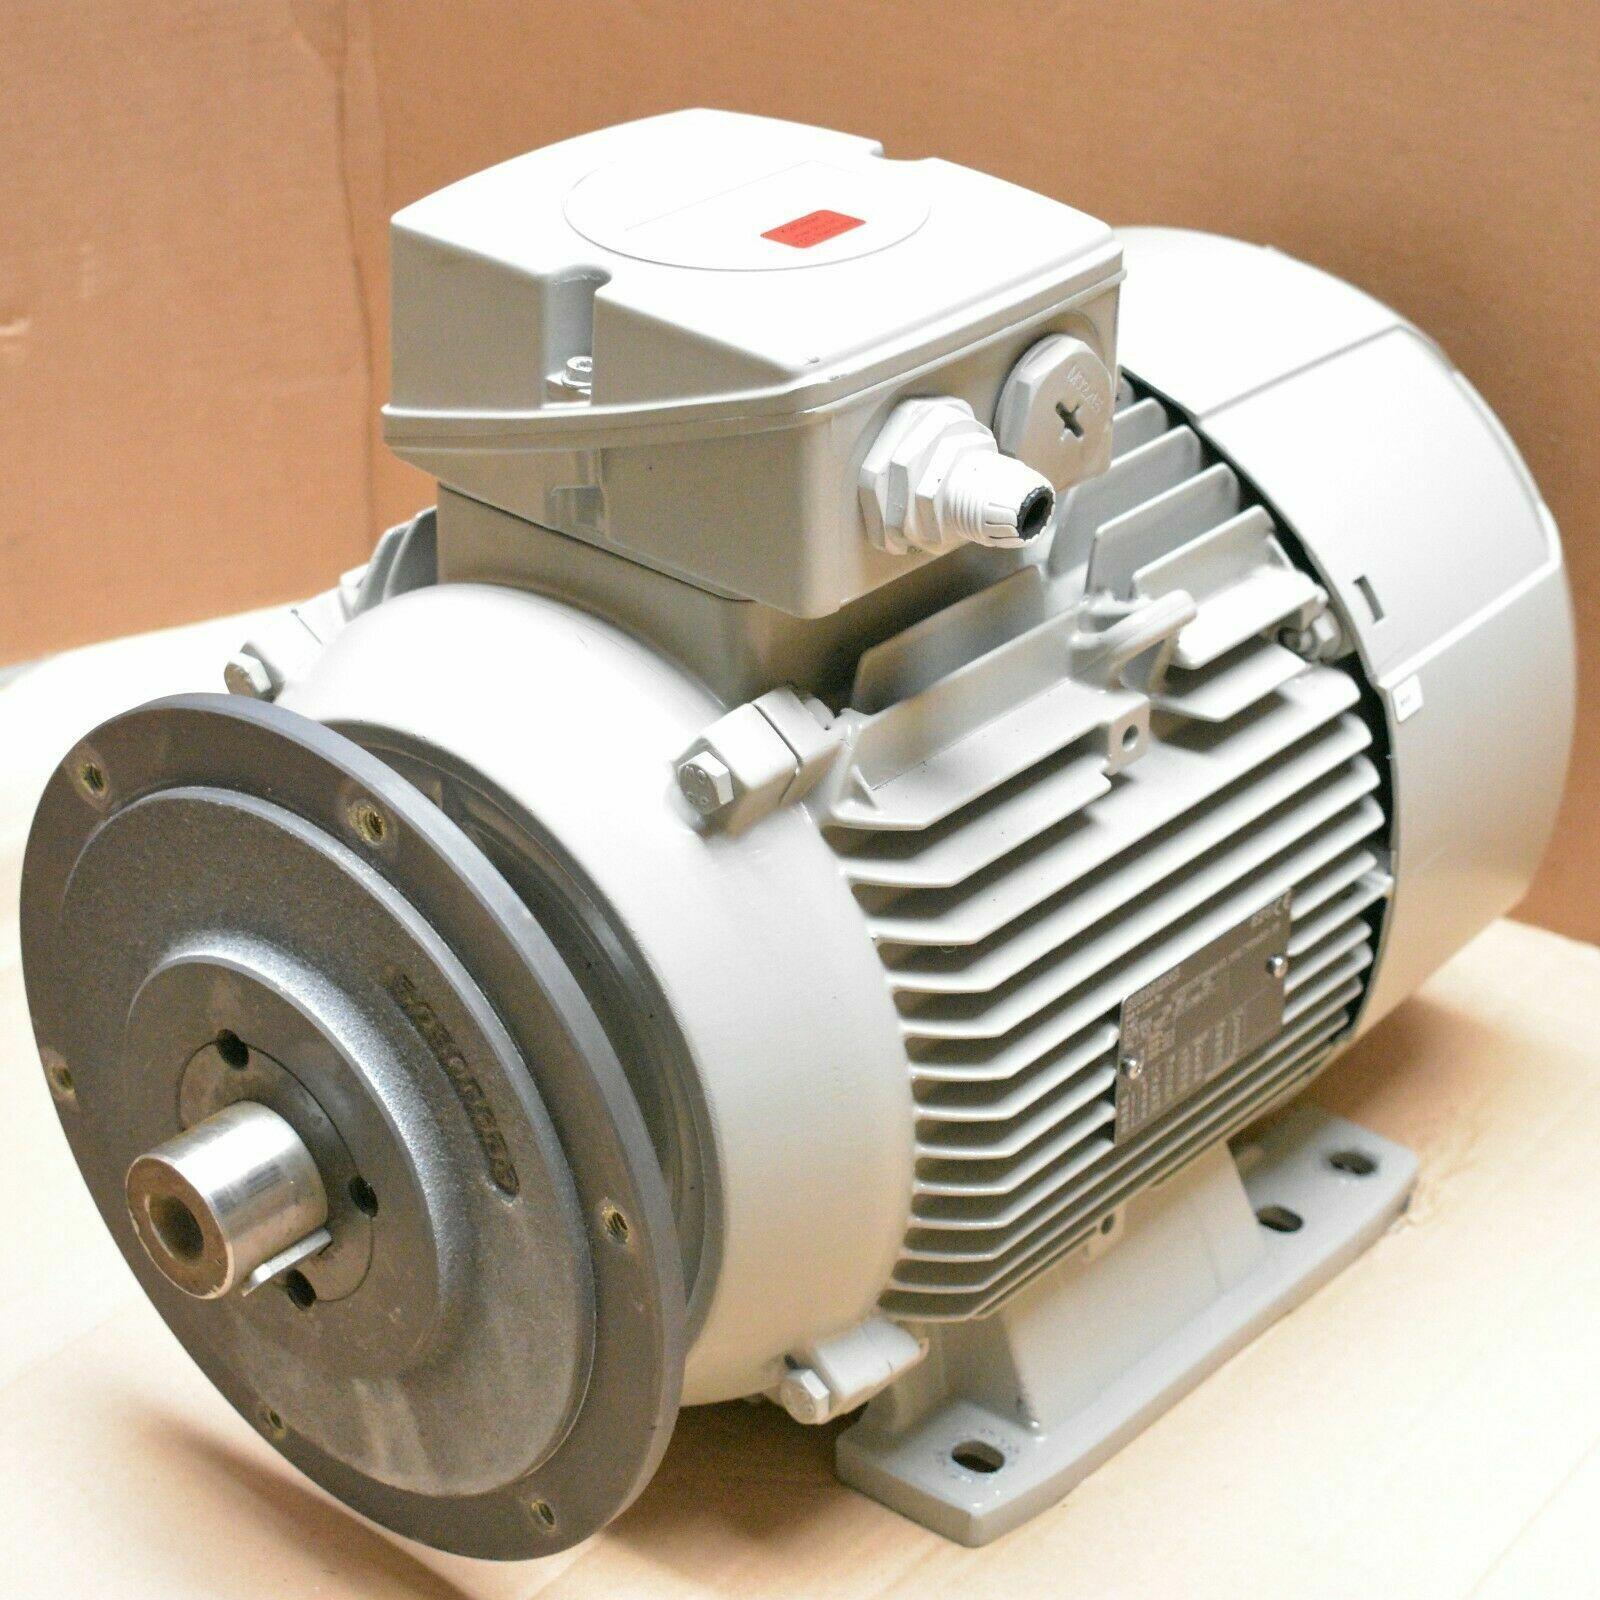 16GA030 Getriebemotor Gleichstrommotor Elektromotor Motor 6V DC 100rpm Welle 3mm